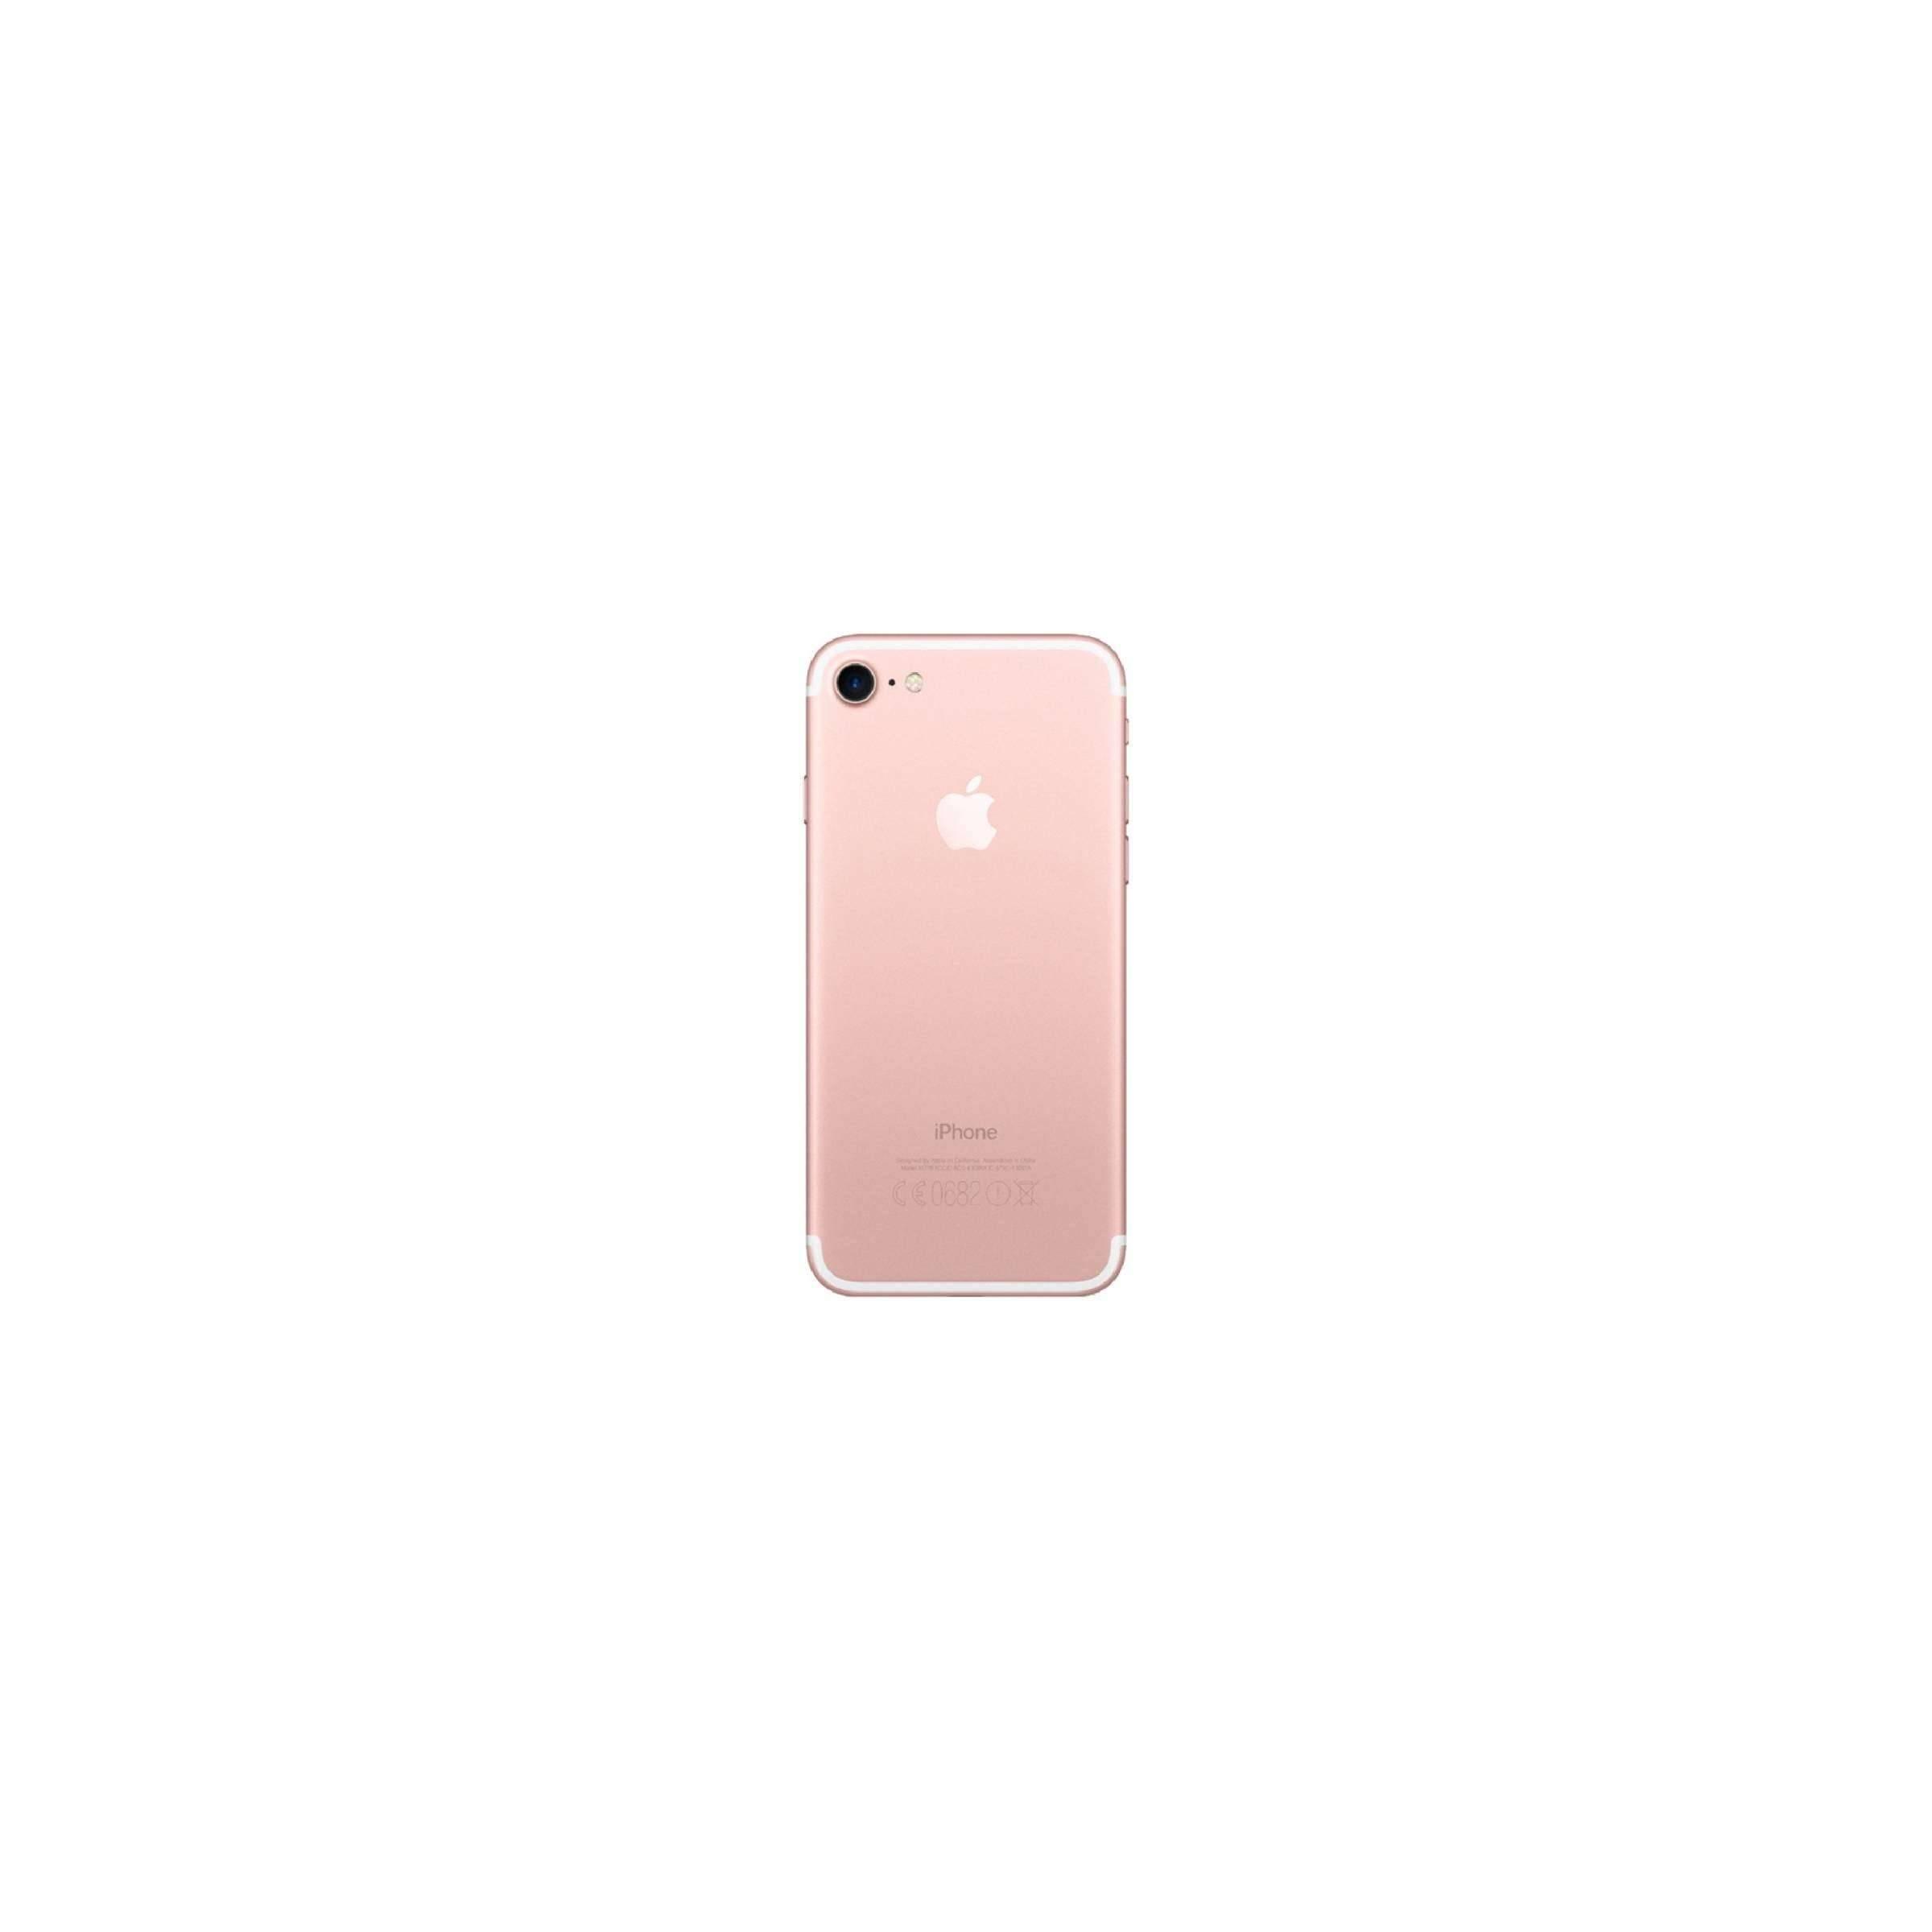 sinox Iphone 7 housing farve rosegold fra mackabler.dk